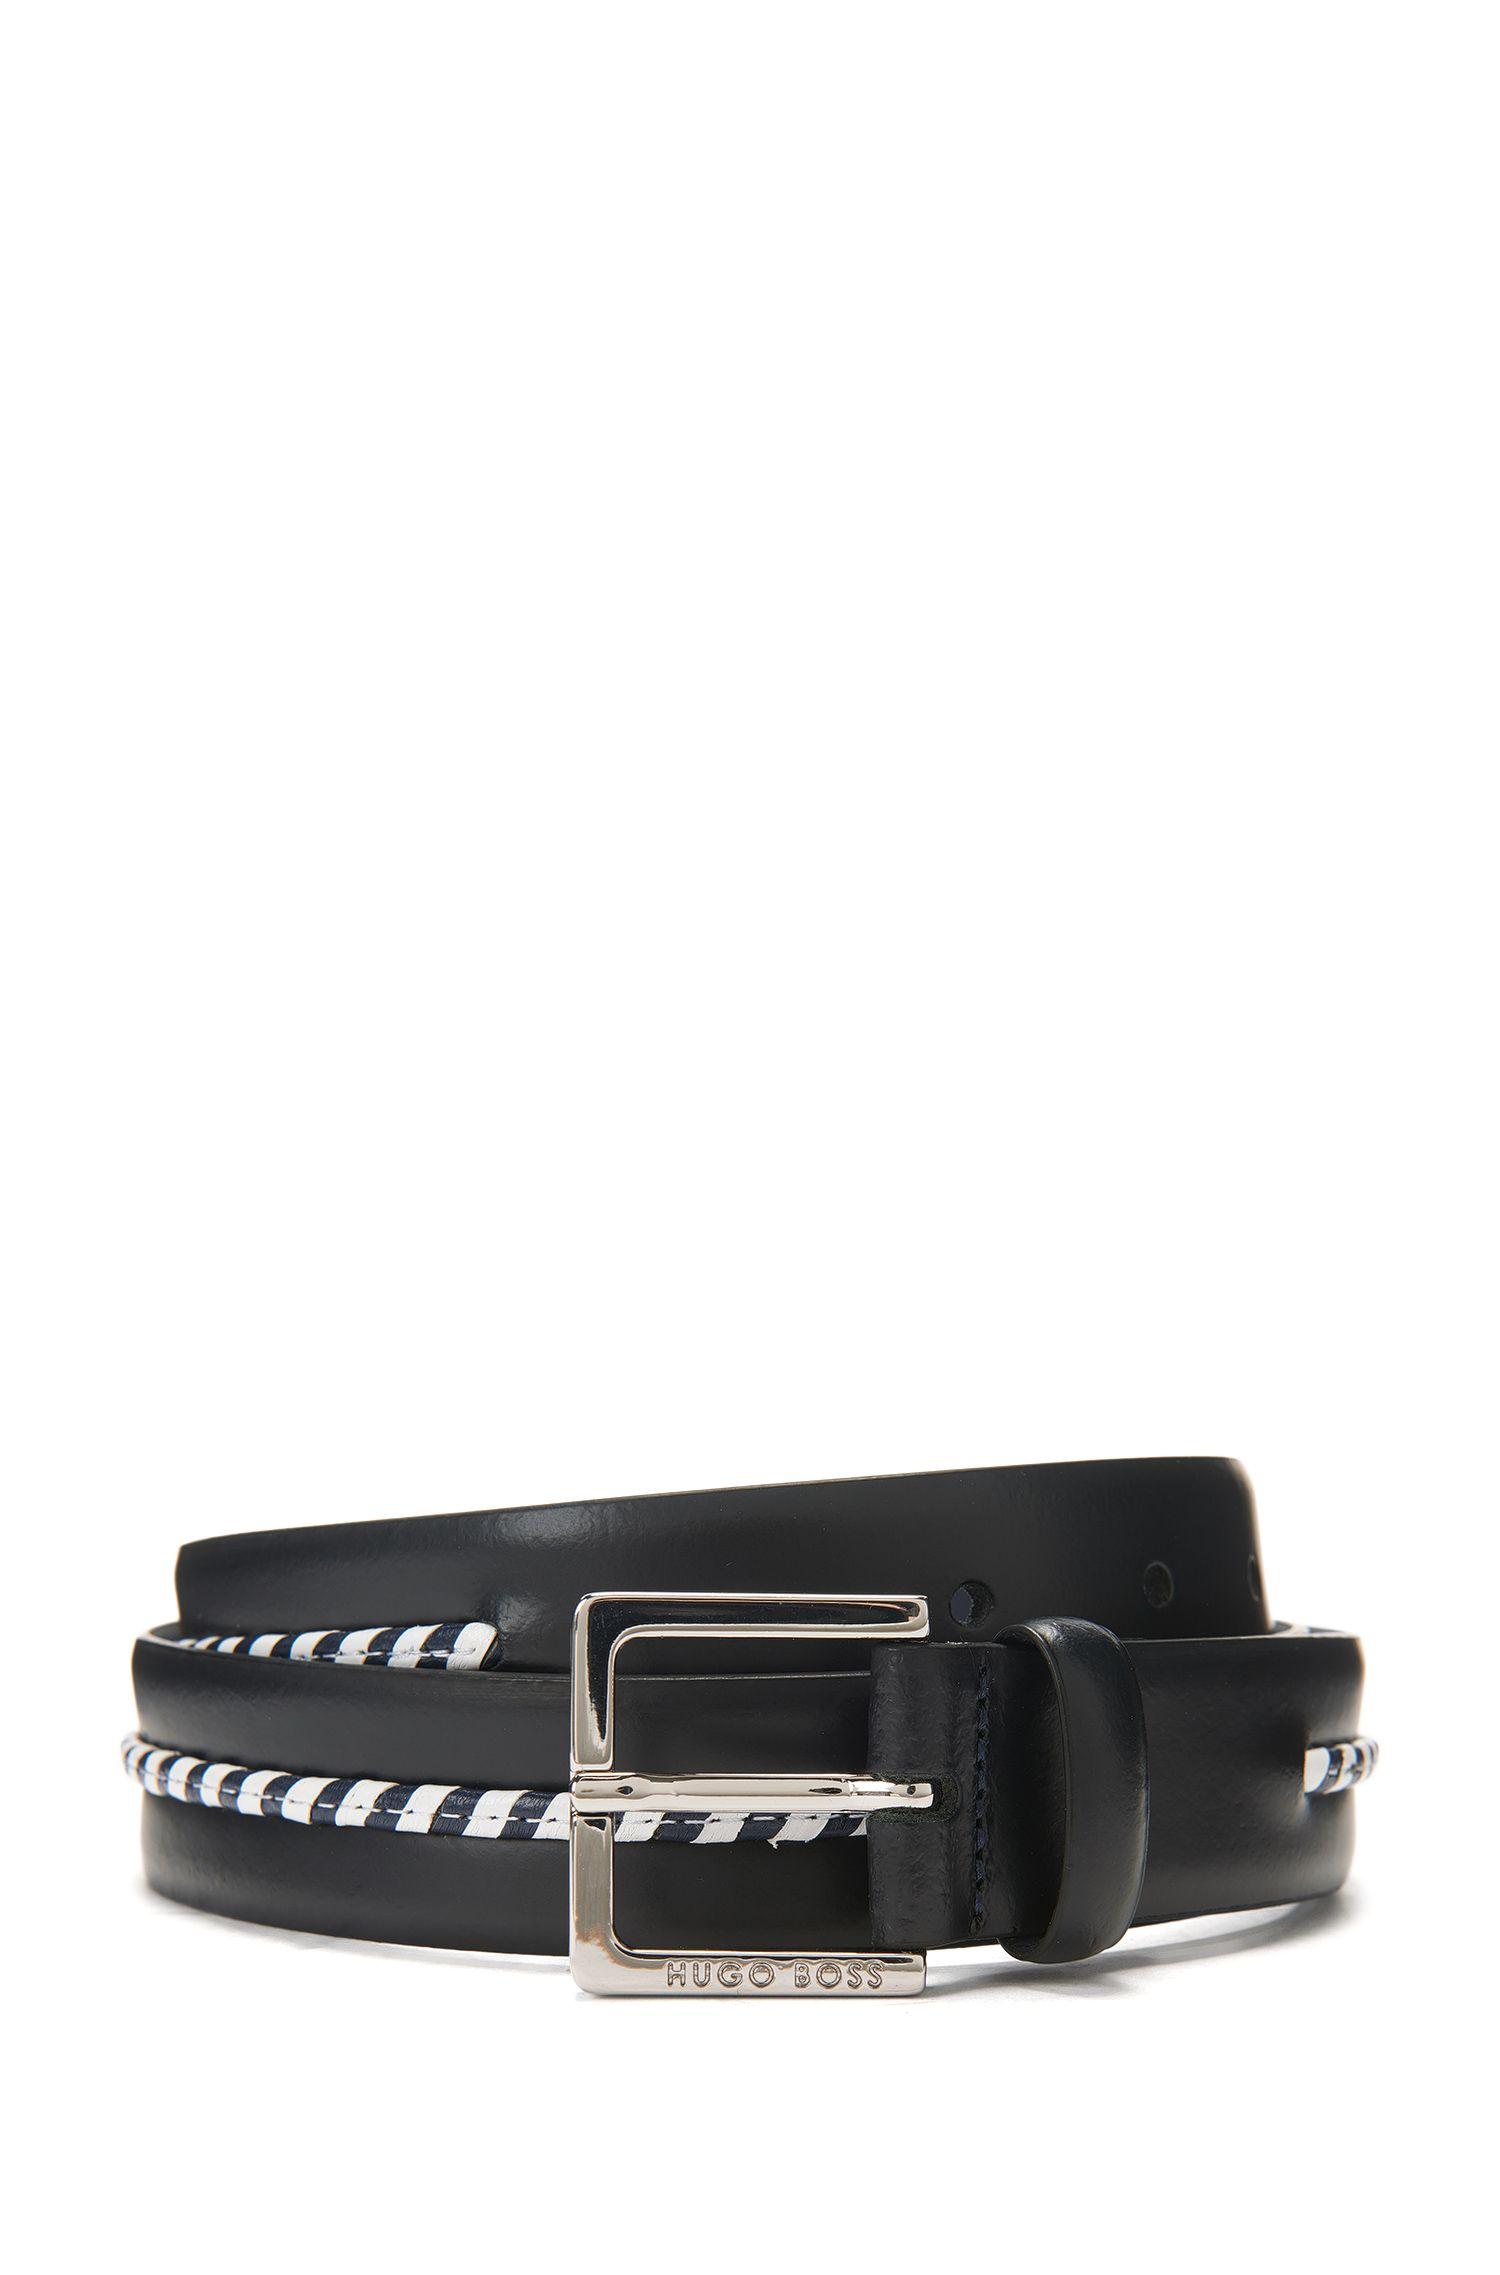 Stripe-Accent Leather Belt | Samu